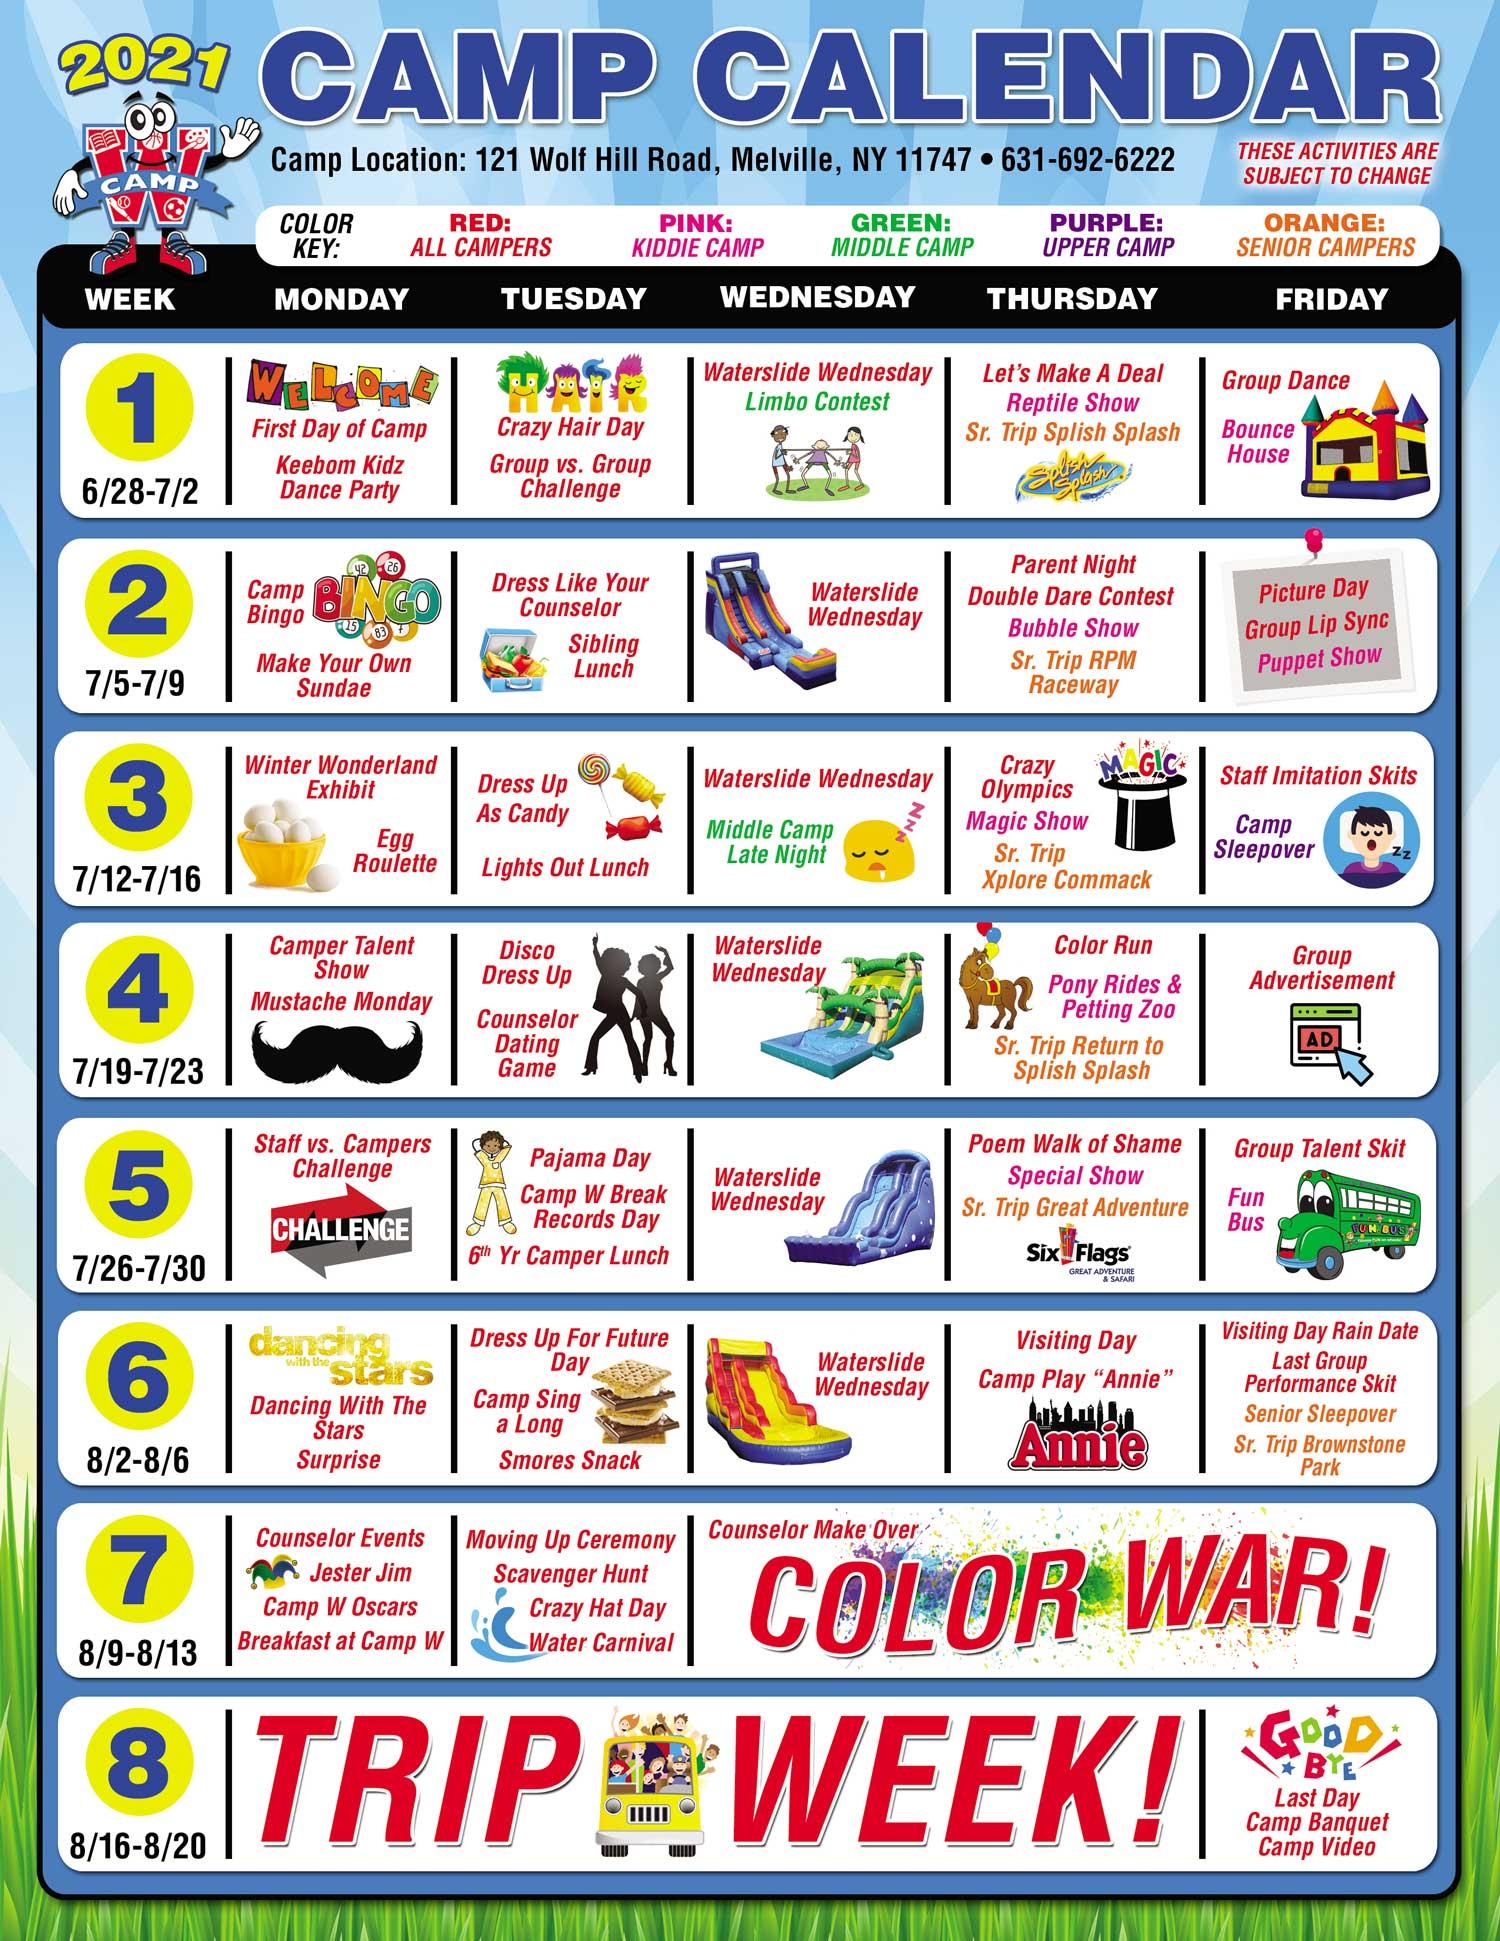 Camp W Summer Camp 2021 Calendar